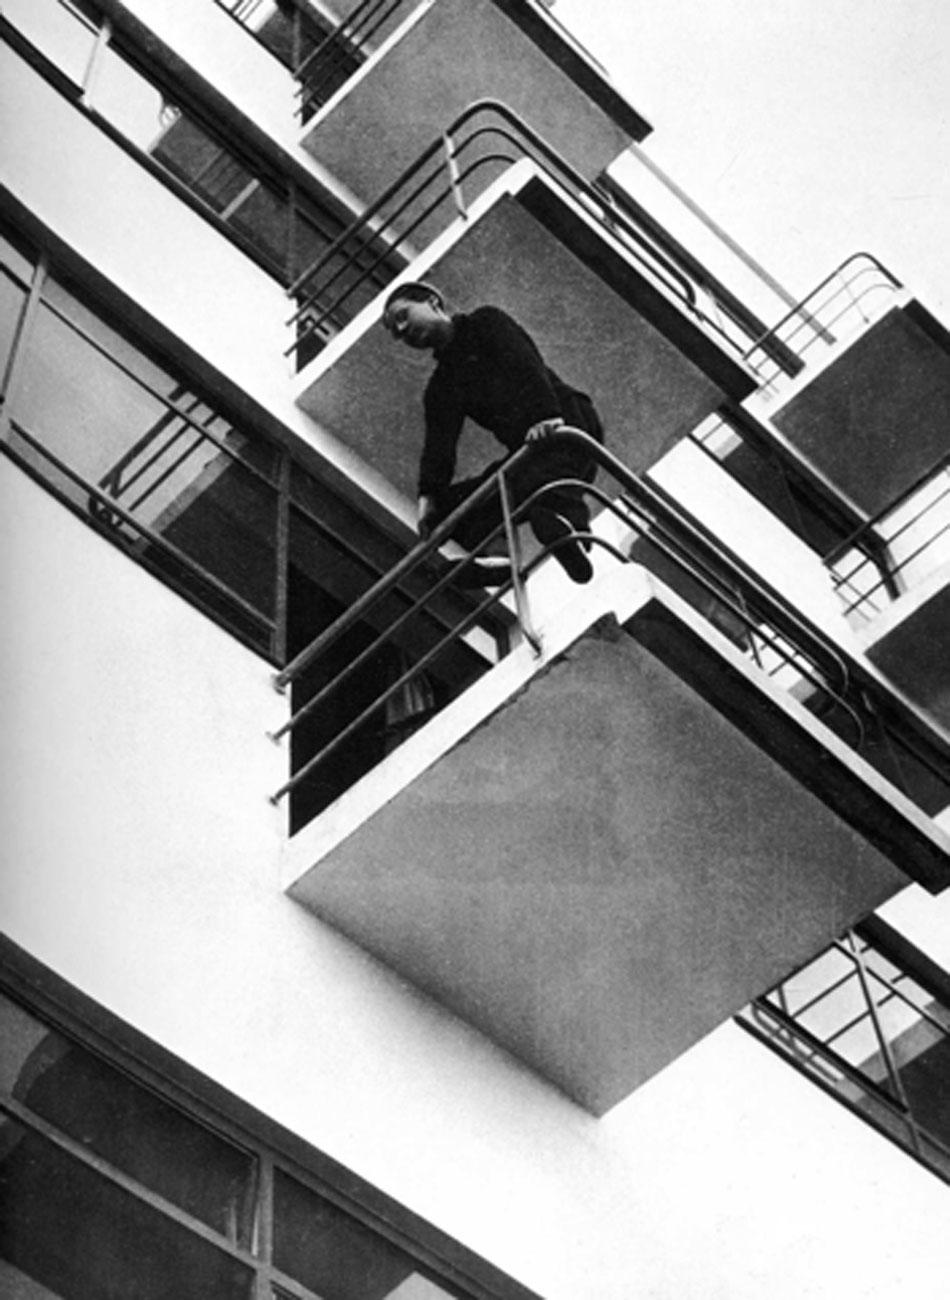 Laszlo Moholy-Nagy. Balcones de la Bauhaus, 1925. Museum Ludwig, Colonia